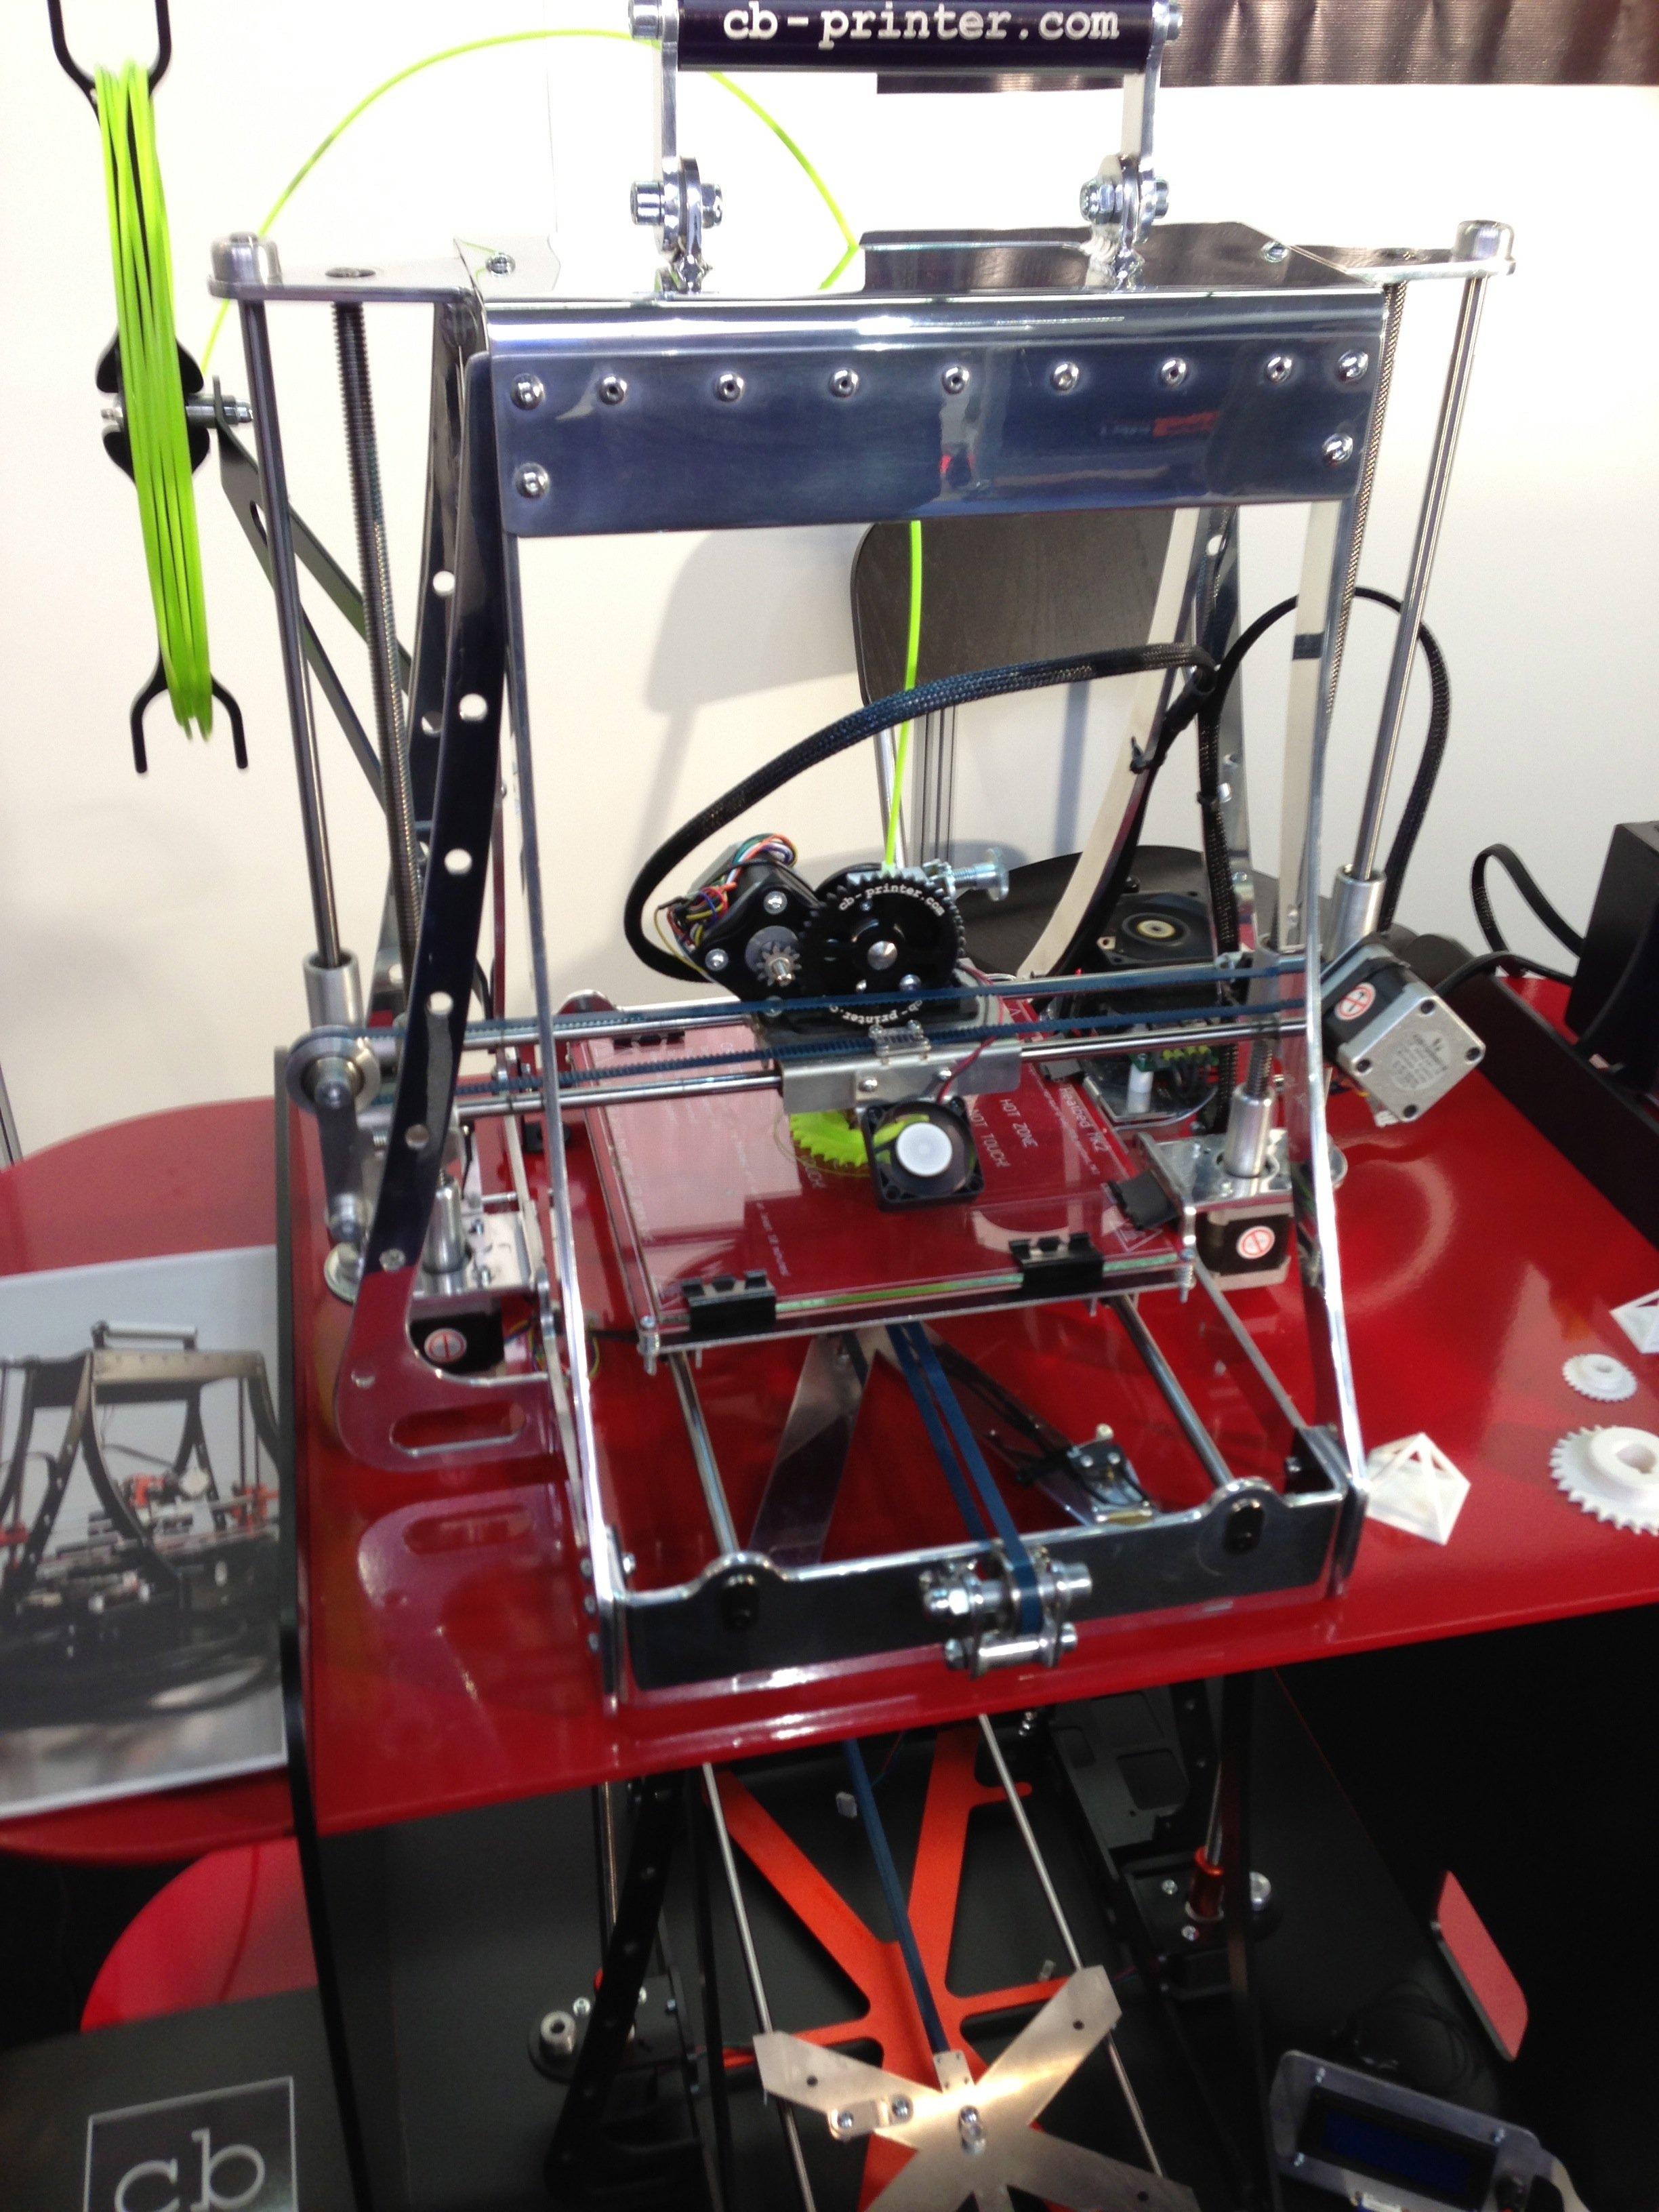 The CB-Printer